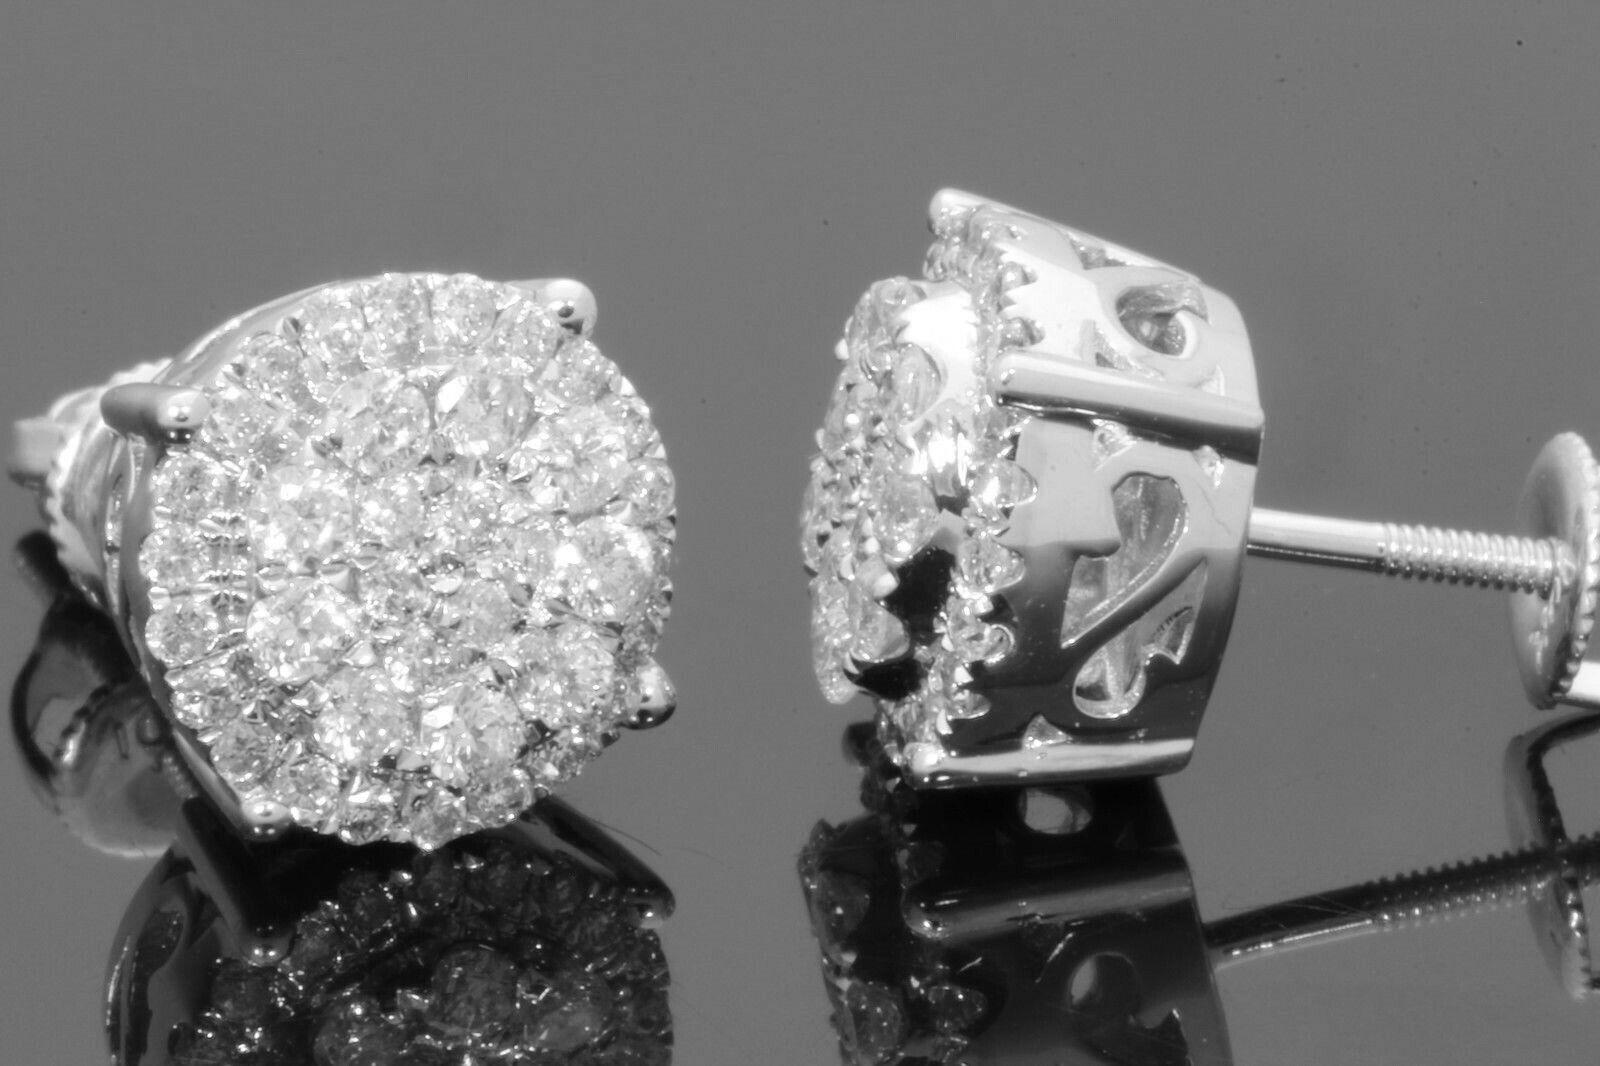 10K WHITE GOLD 1.03 CARAT MENS/WOMENS 10mm REAL GENUINE DIAMONDS EARRING STUDS